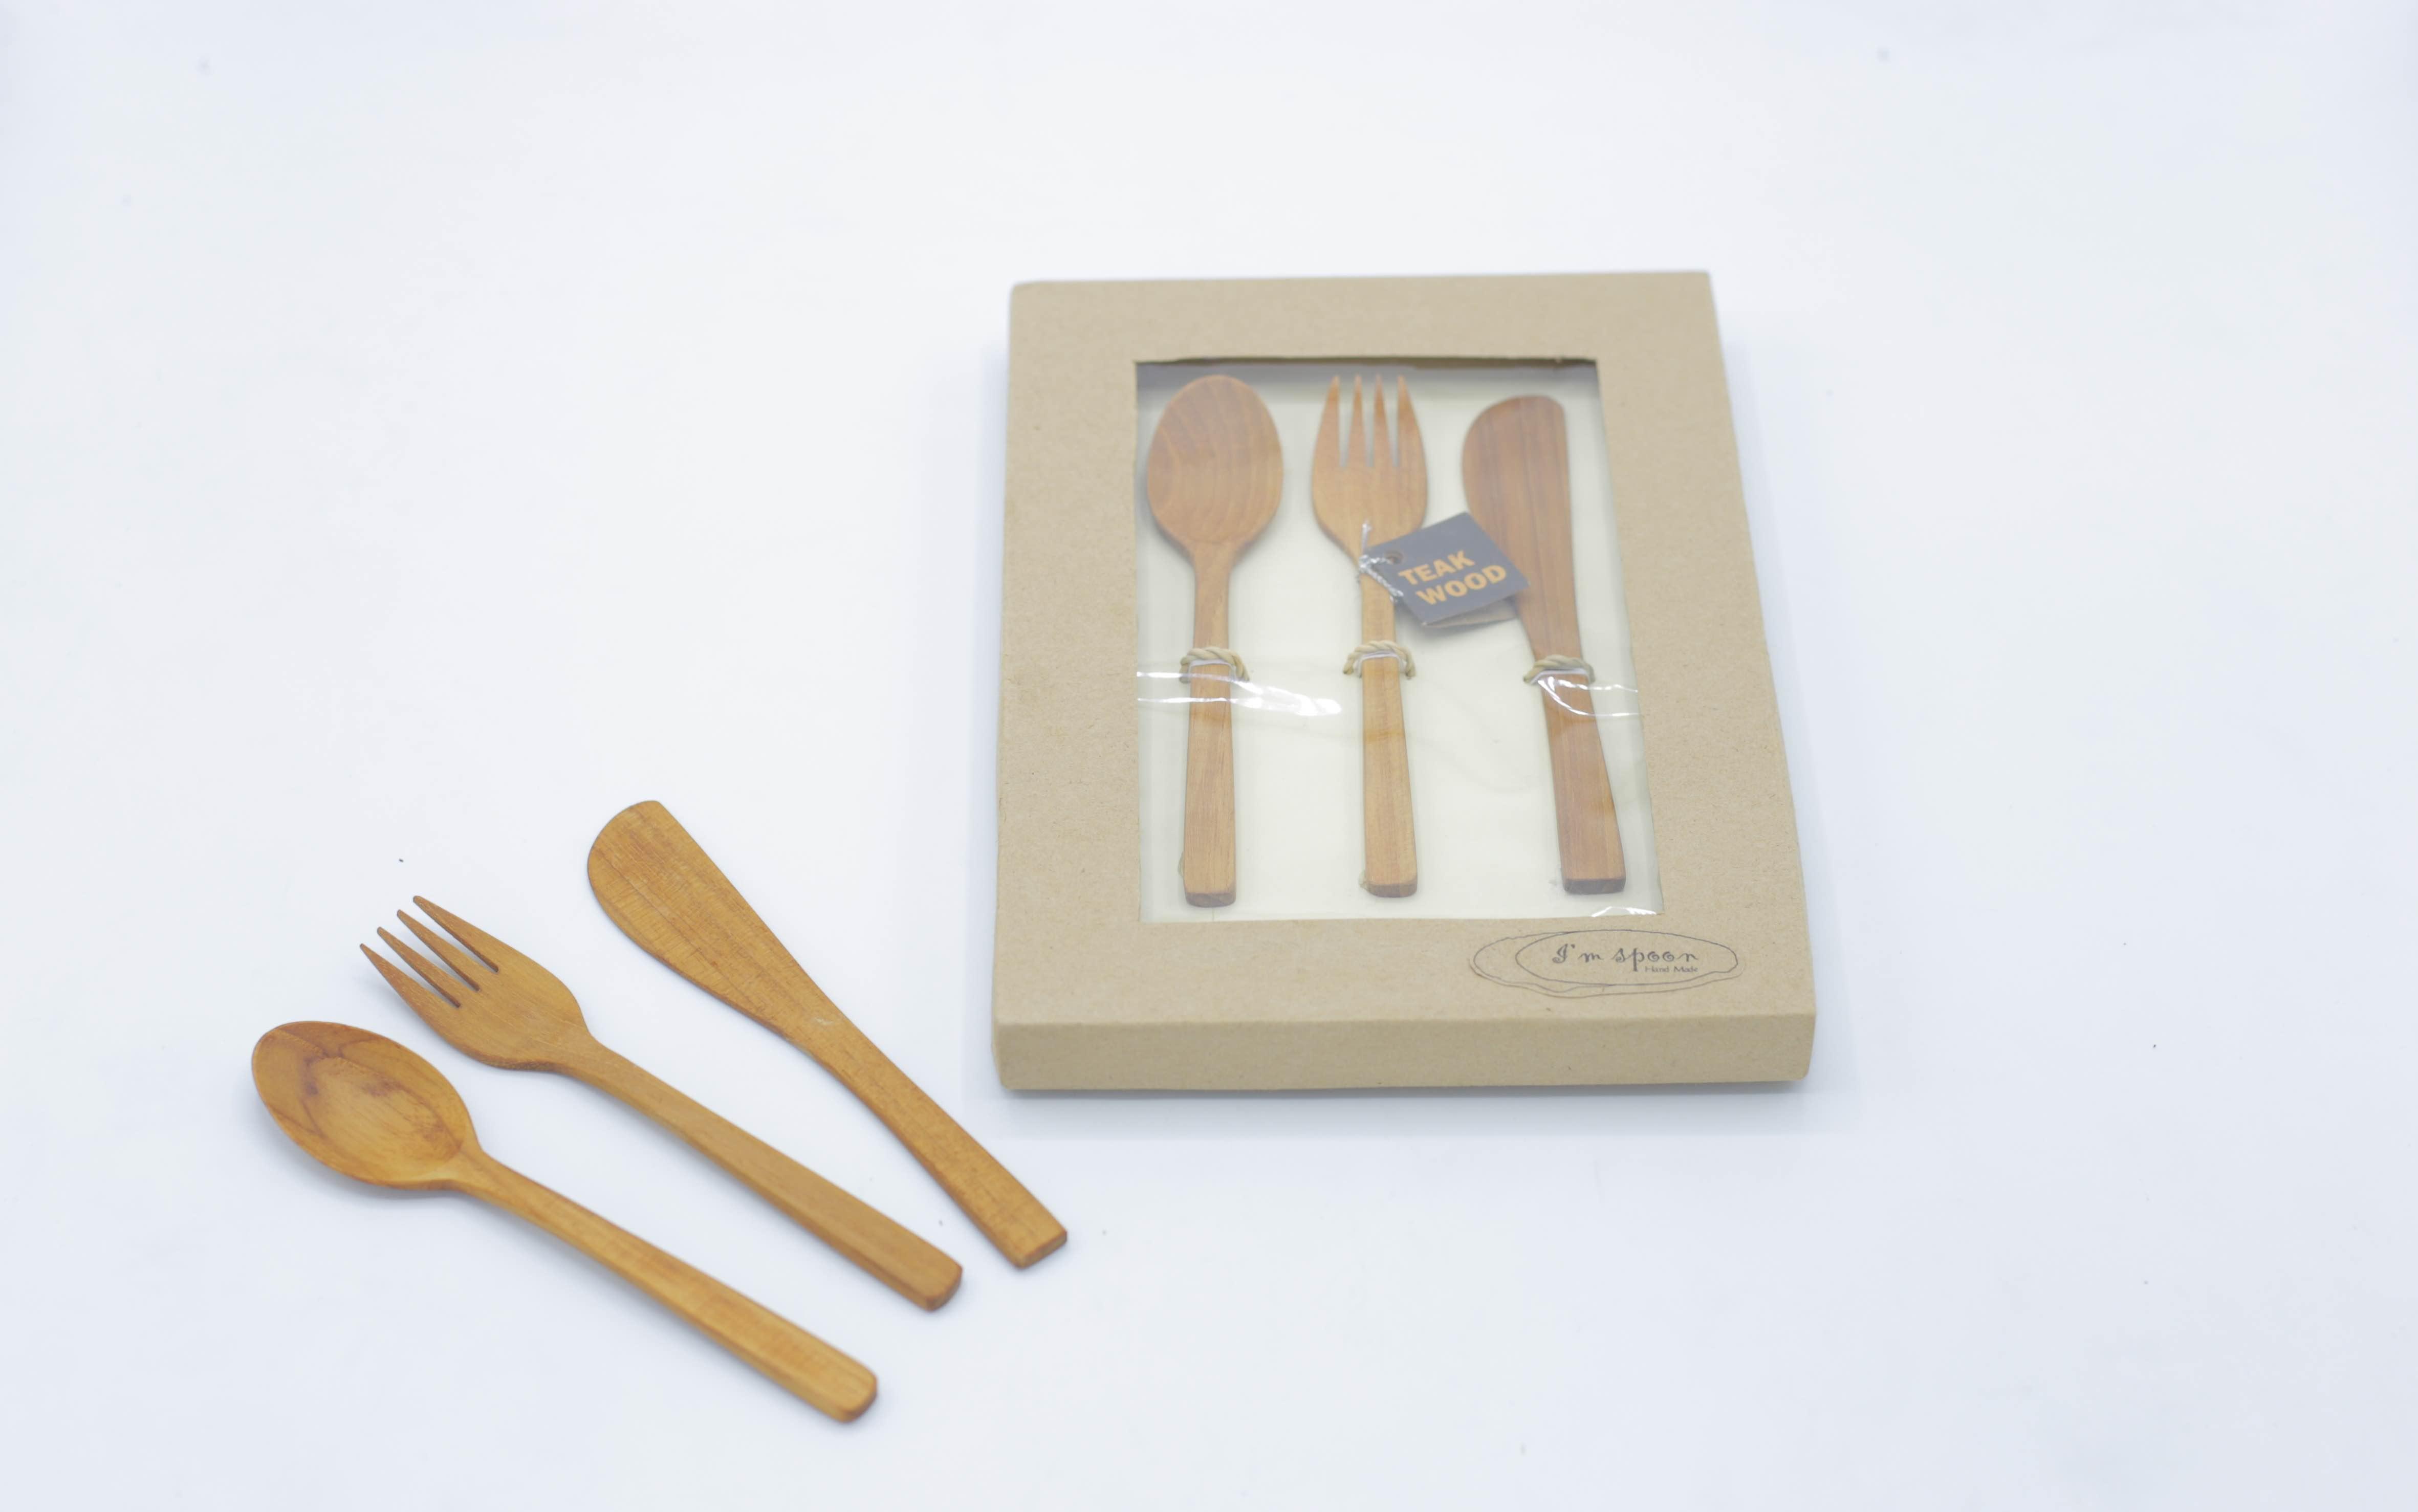 D00055 ชุดช้อนไม้ I am spoon